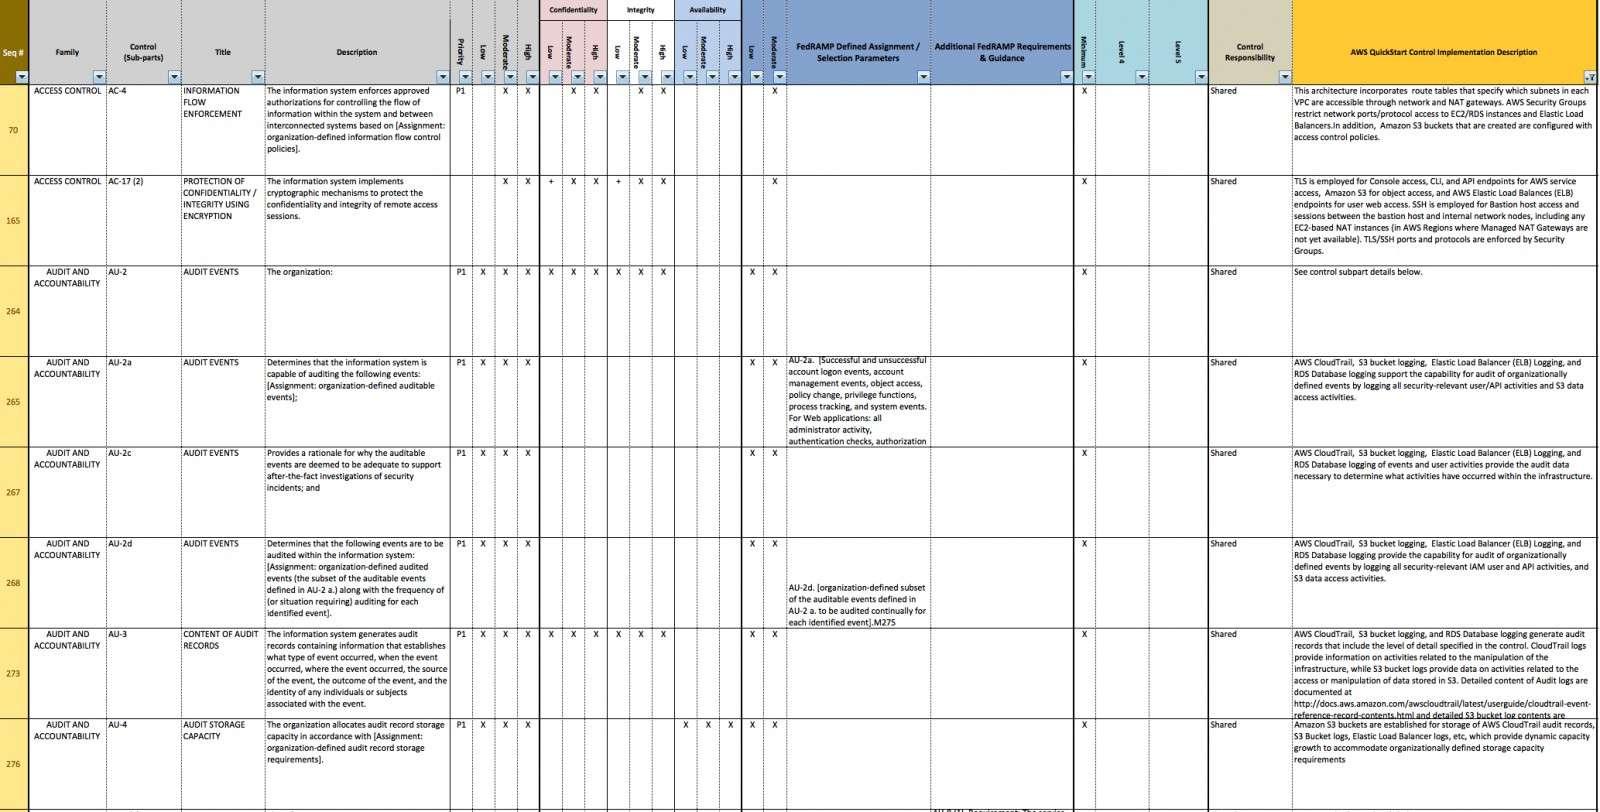 Nist Sp 800 53 Rev 4 Spreadsheet With Regard To Nist Sp 800 53 Rev 4 Spreadsheet  Readleaf Document